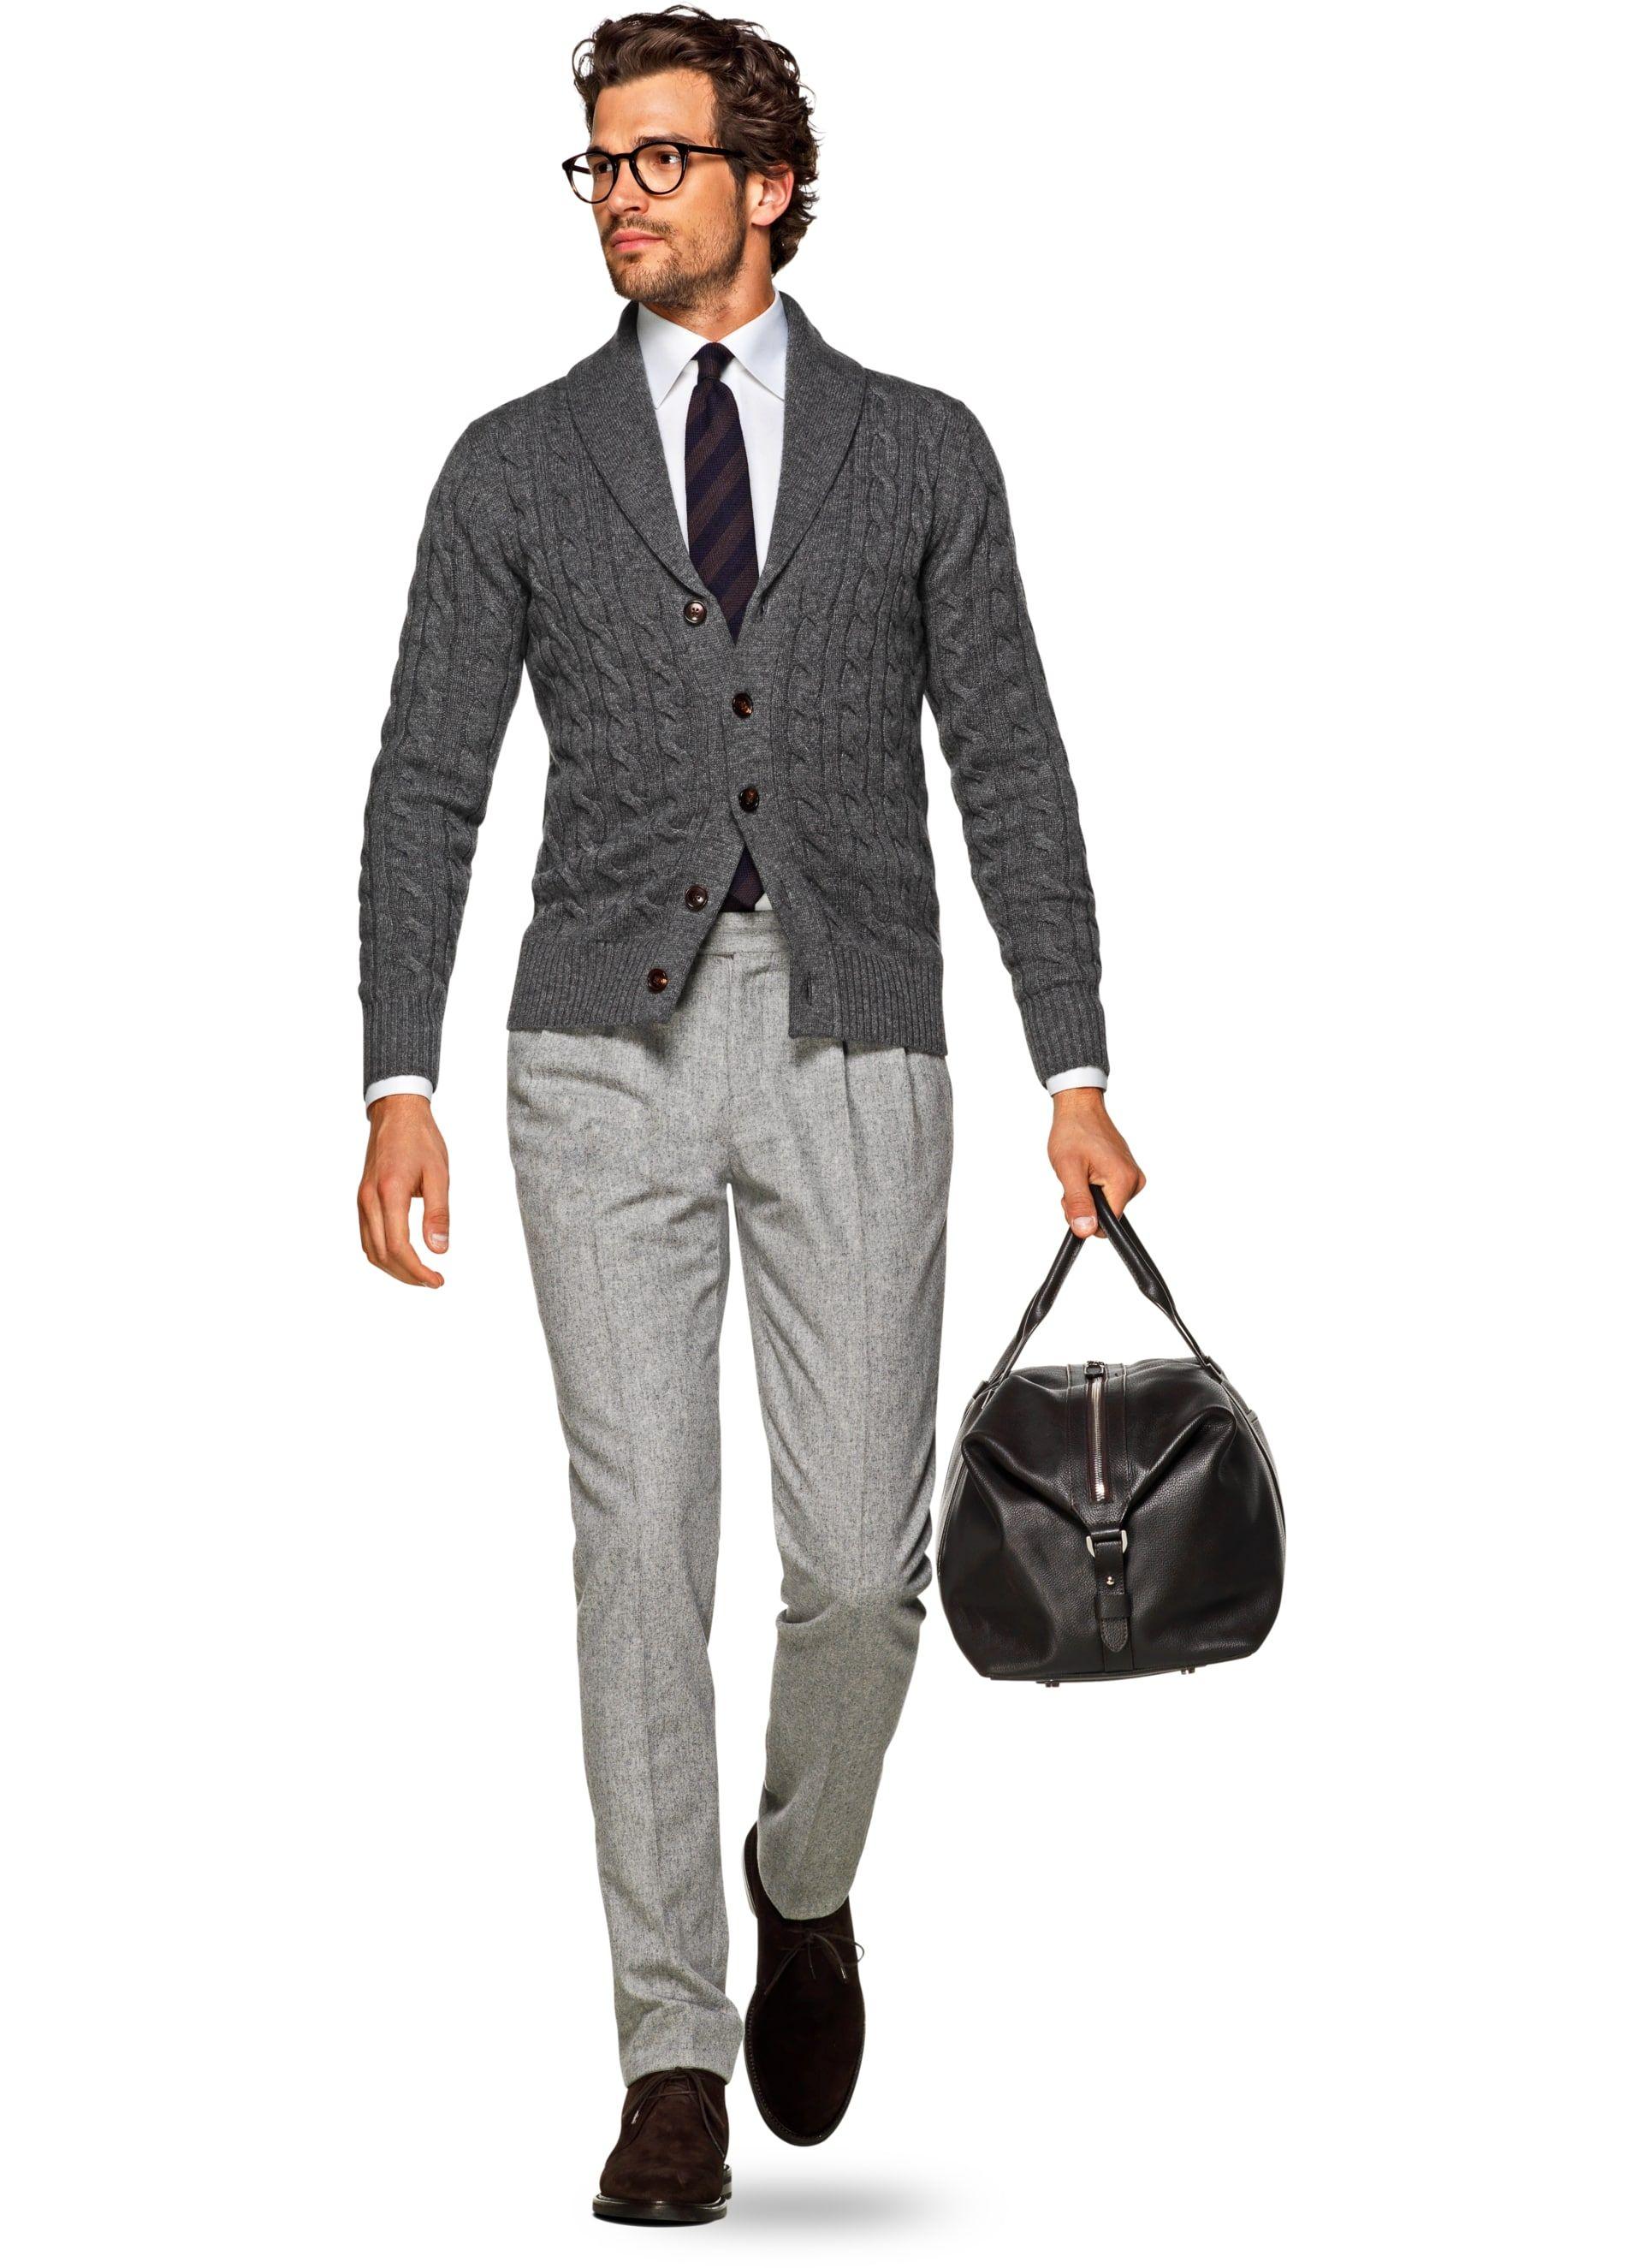 Wonderlijk Dark Grey Shawl Collar Cardigan Sw840   Suitsupply Online Store PN-54